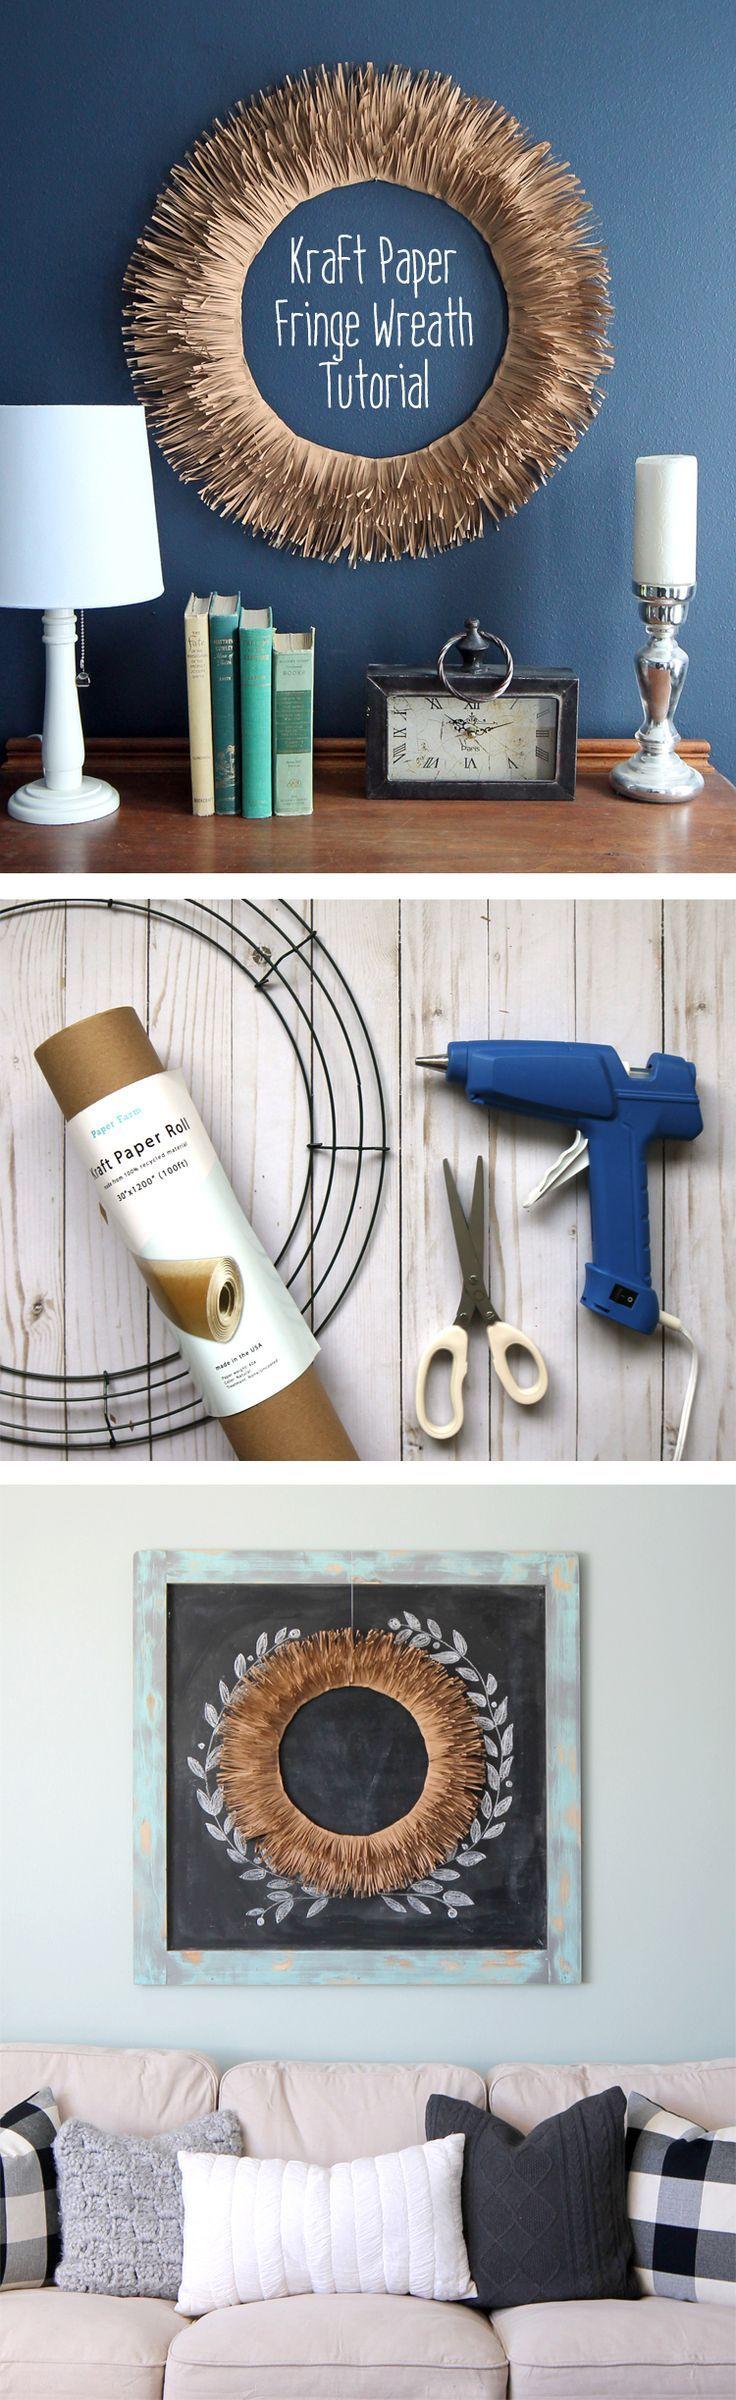 Kraft Paper Fringe Wreath Tutorial